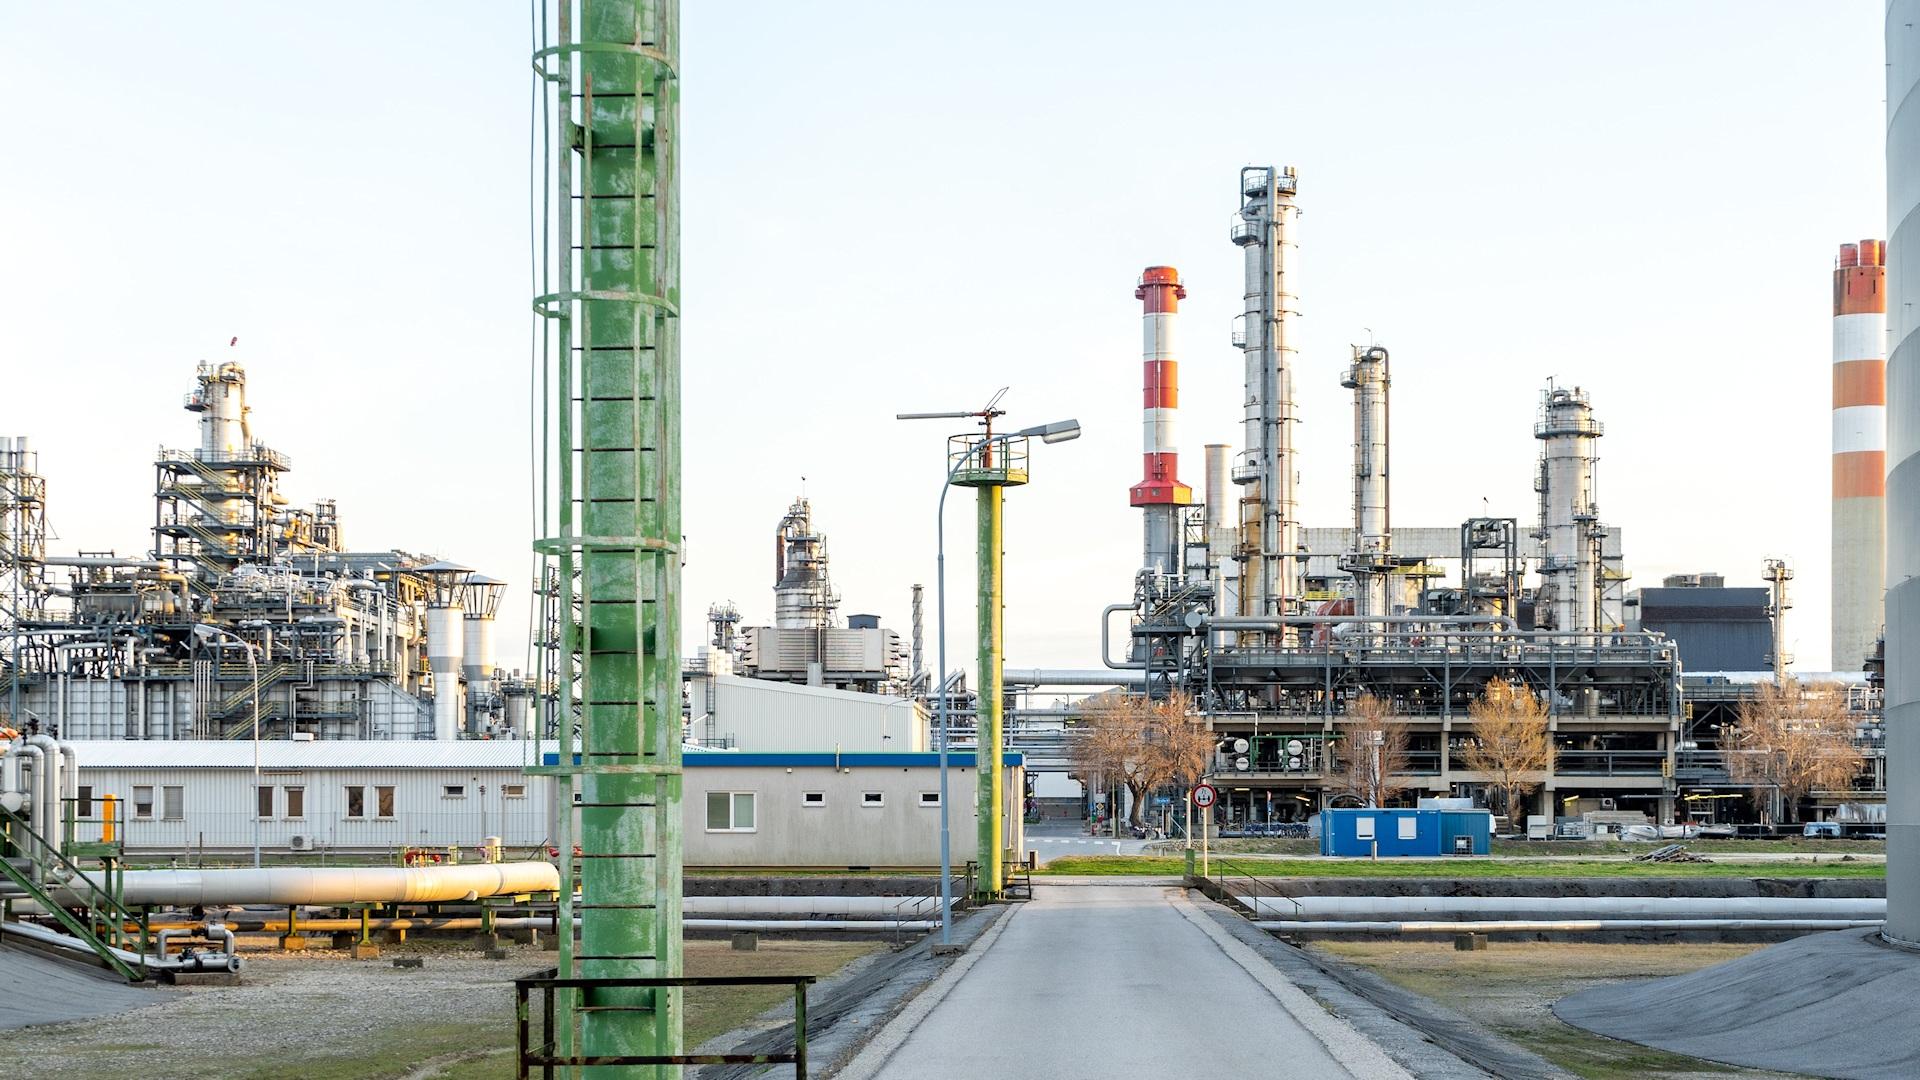 Modern oil refinery